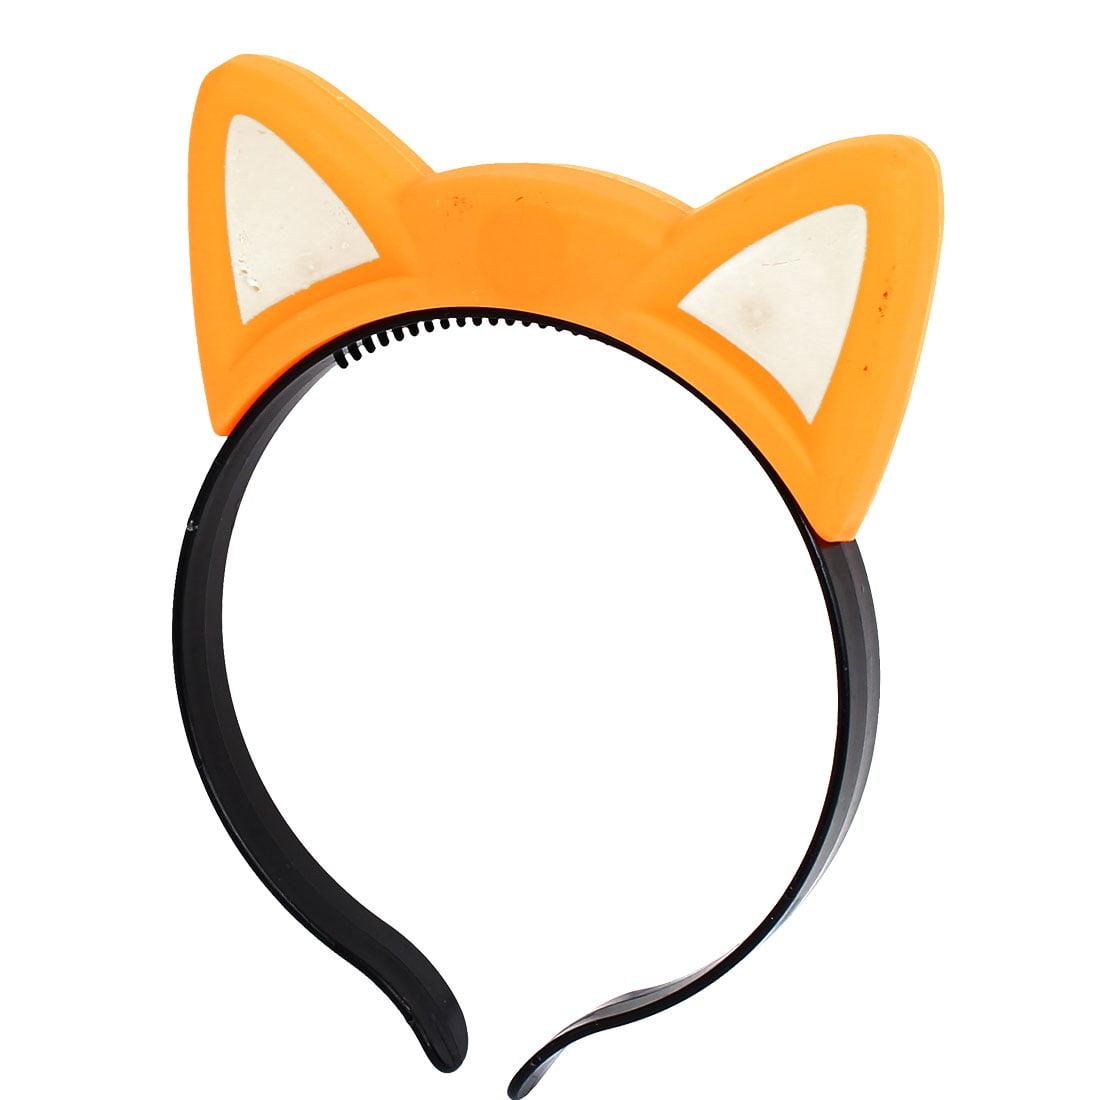 Cosplay Flash  Cat Ear Light Blinking Hair Band Hairband Headband Orange - image 3 de 3